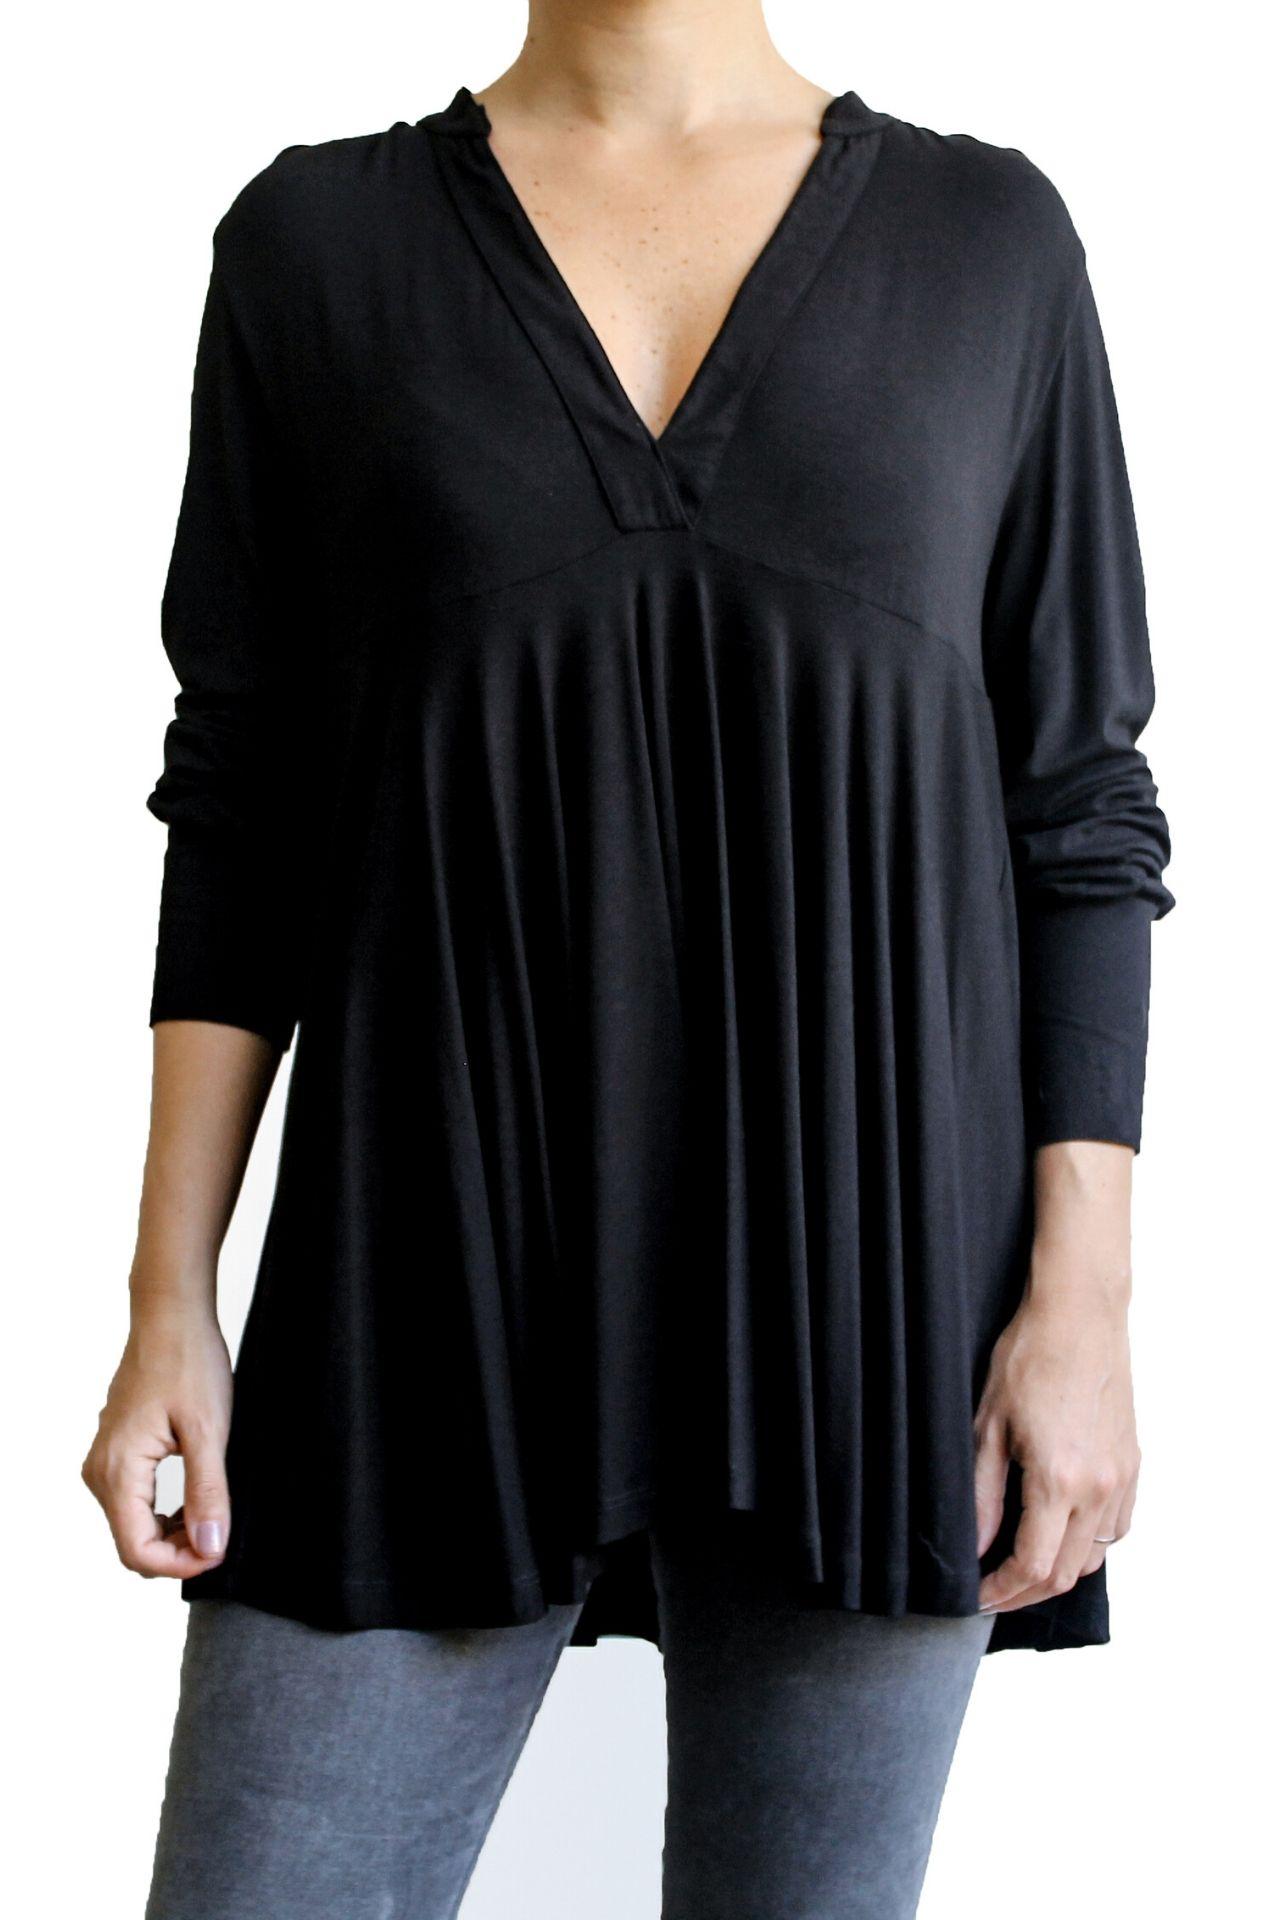 Polo negro en Viscosa, manga con capas y hombros sueltos.